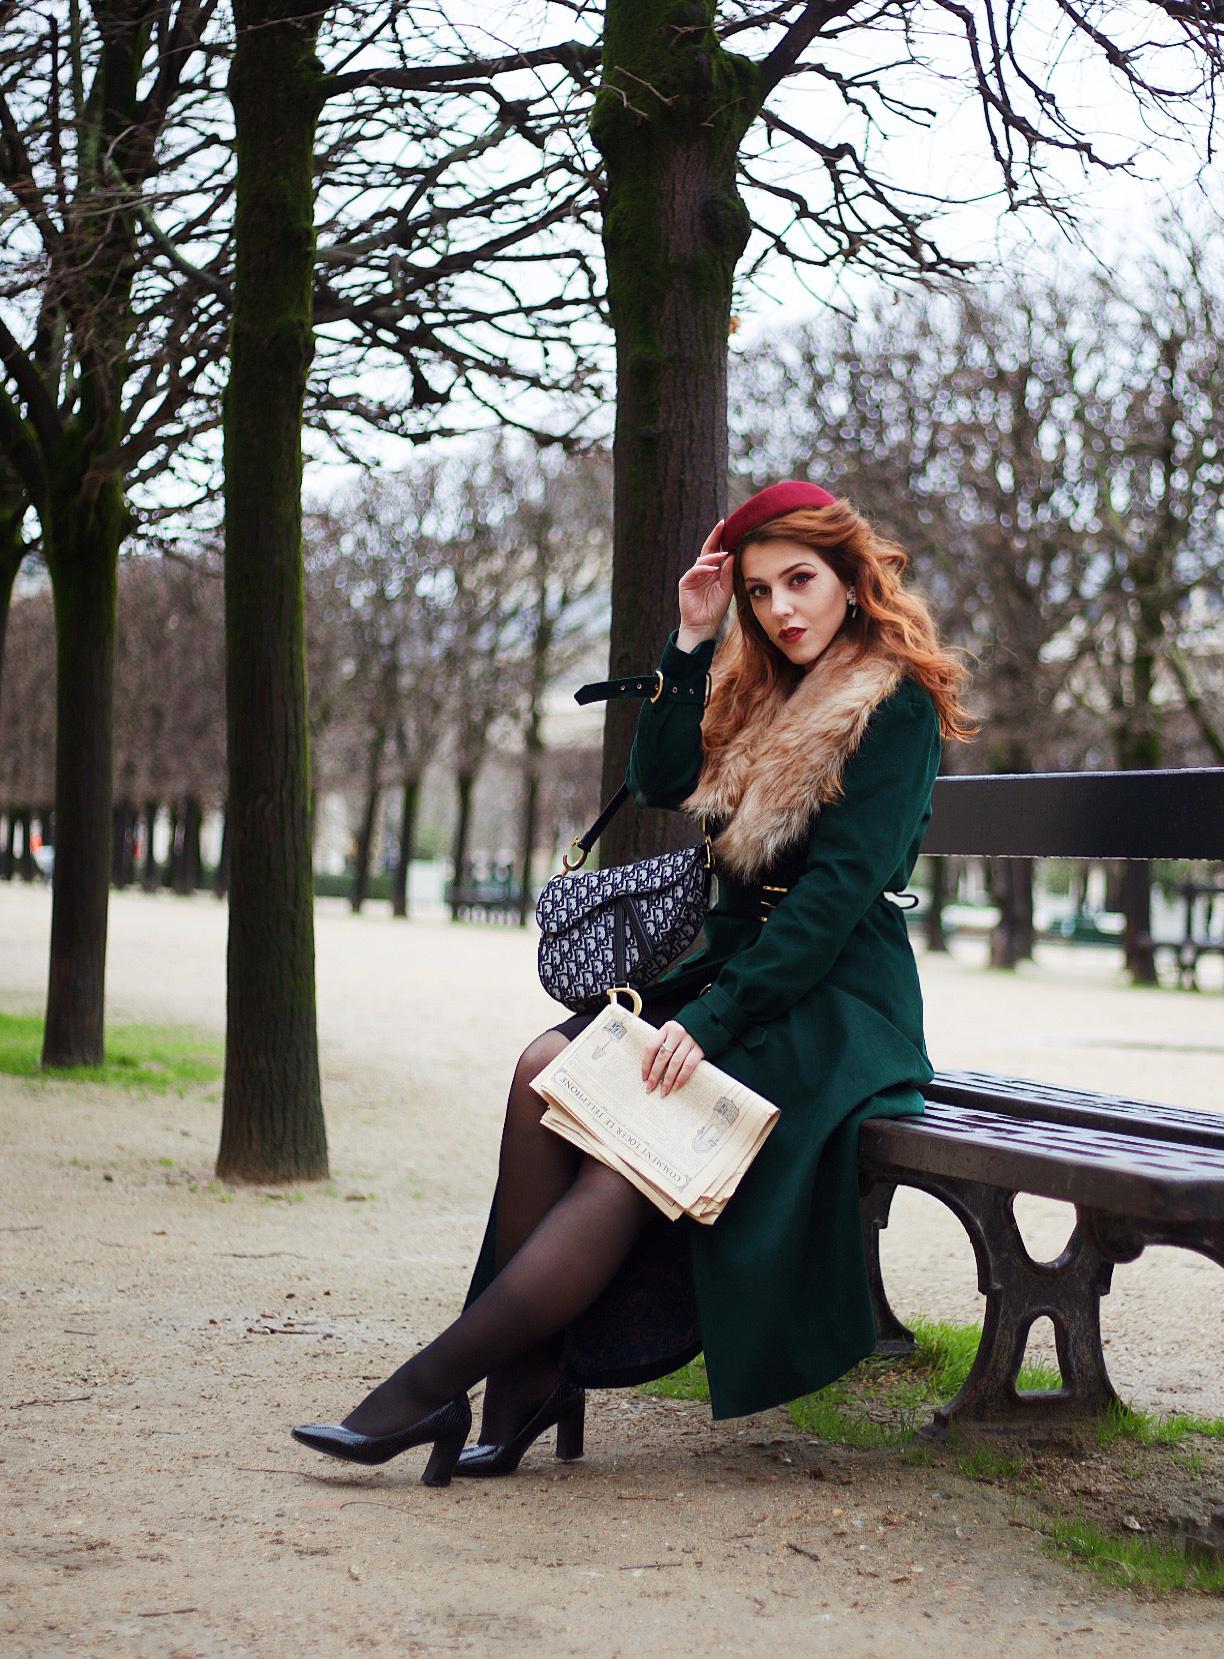 manteau rétro vintage Yvette Libby N'Guyen